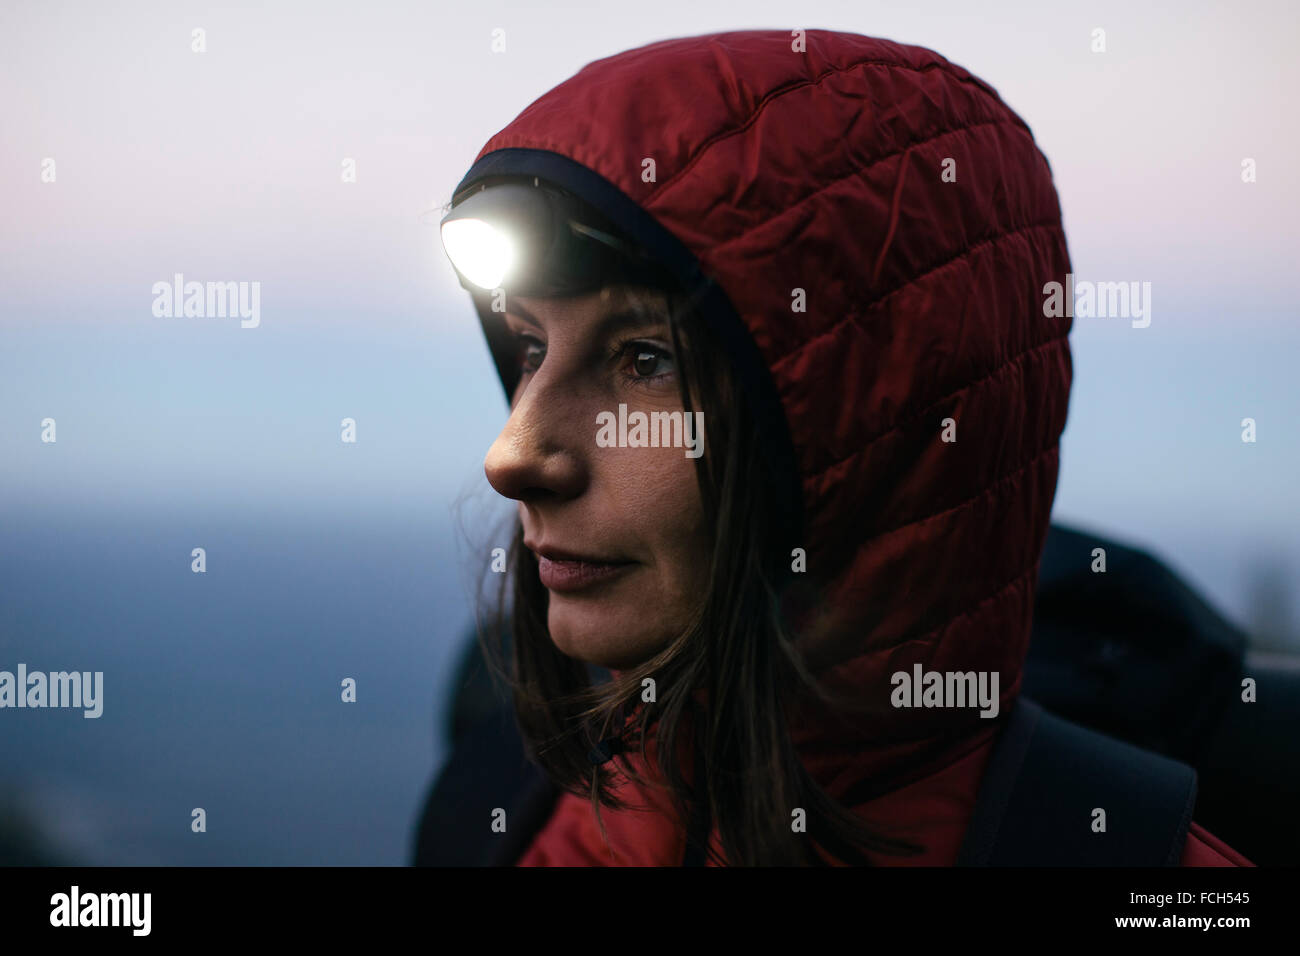 Female hiker wearing headlamp at twilight - Stock Image